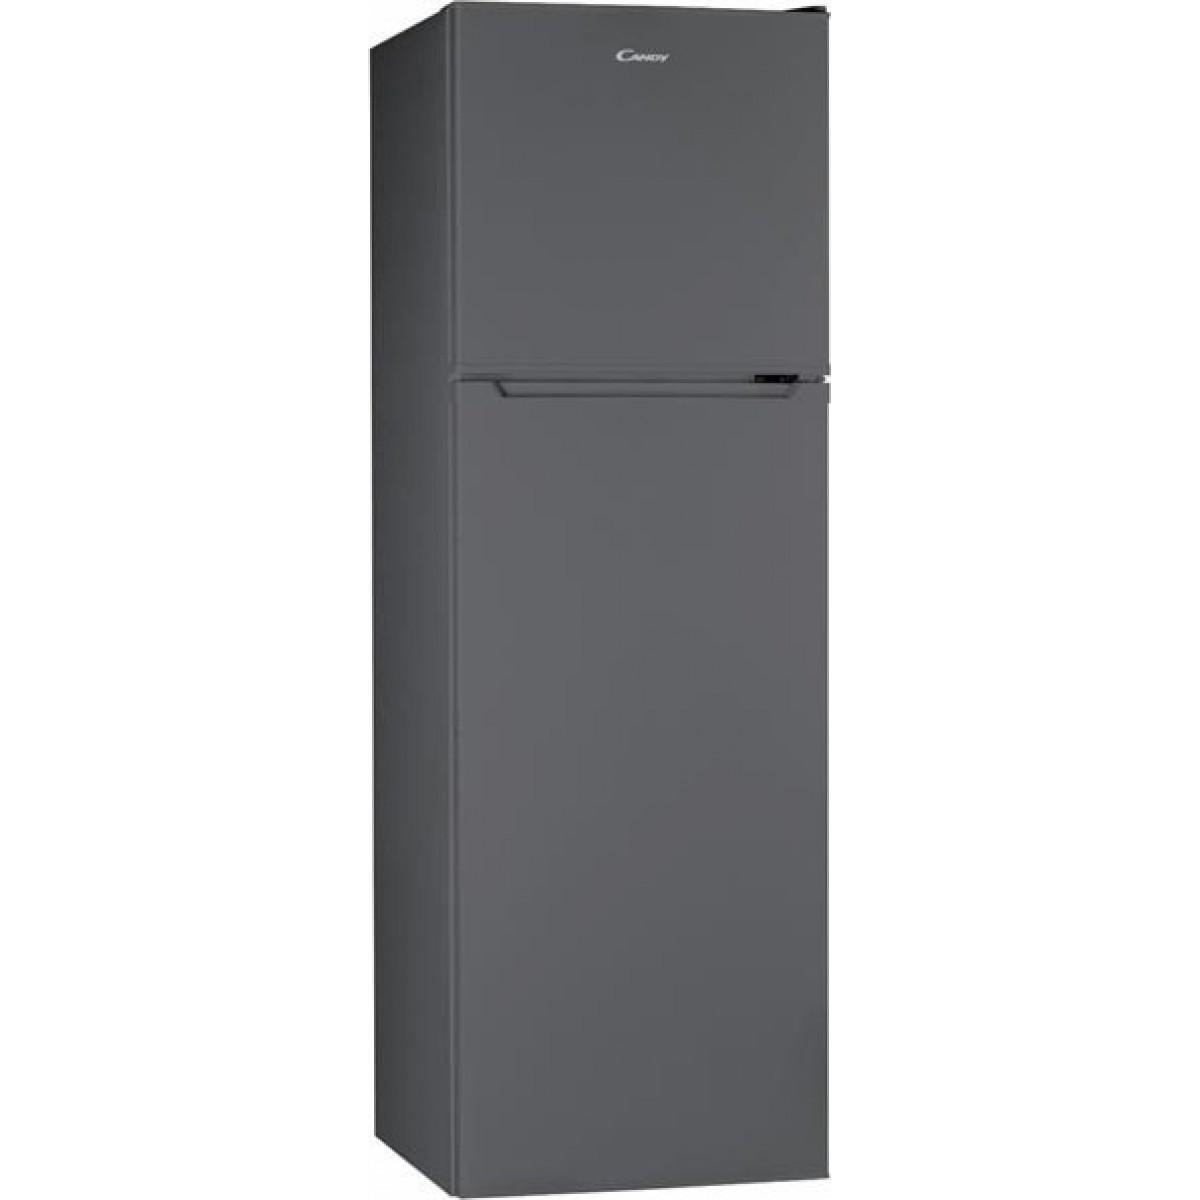 Candy Ψυγείο Δίπορτο NoFrost A+ CMDN 5172X Ψυγεία δίπορτα Ηλεκτρικες Συσκευες - homeelectrics.gr